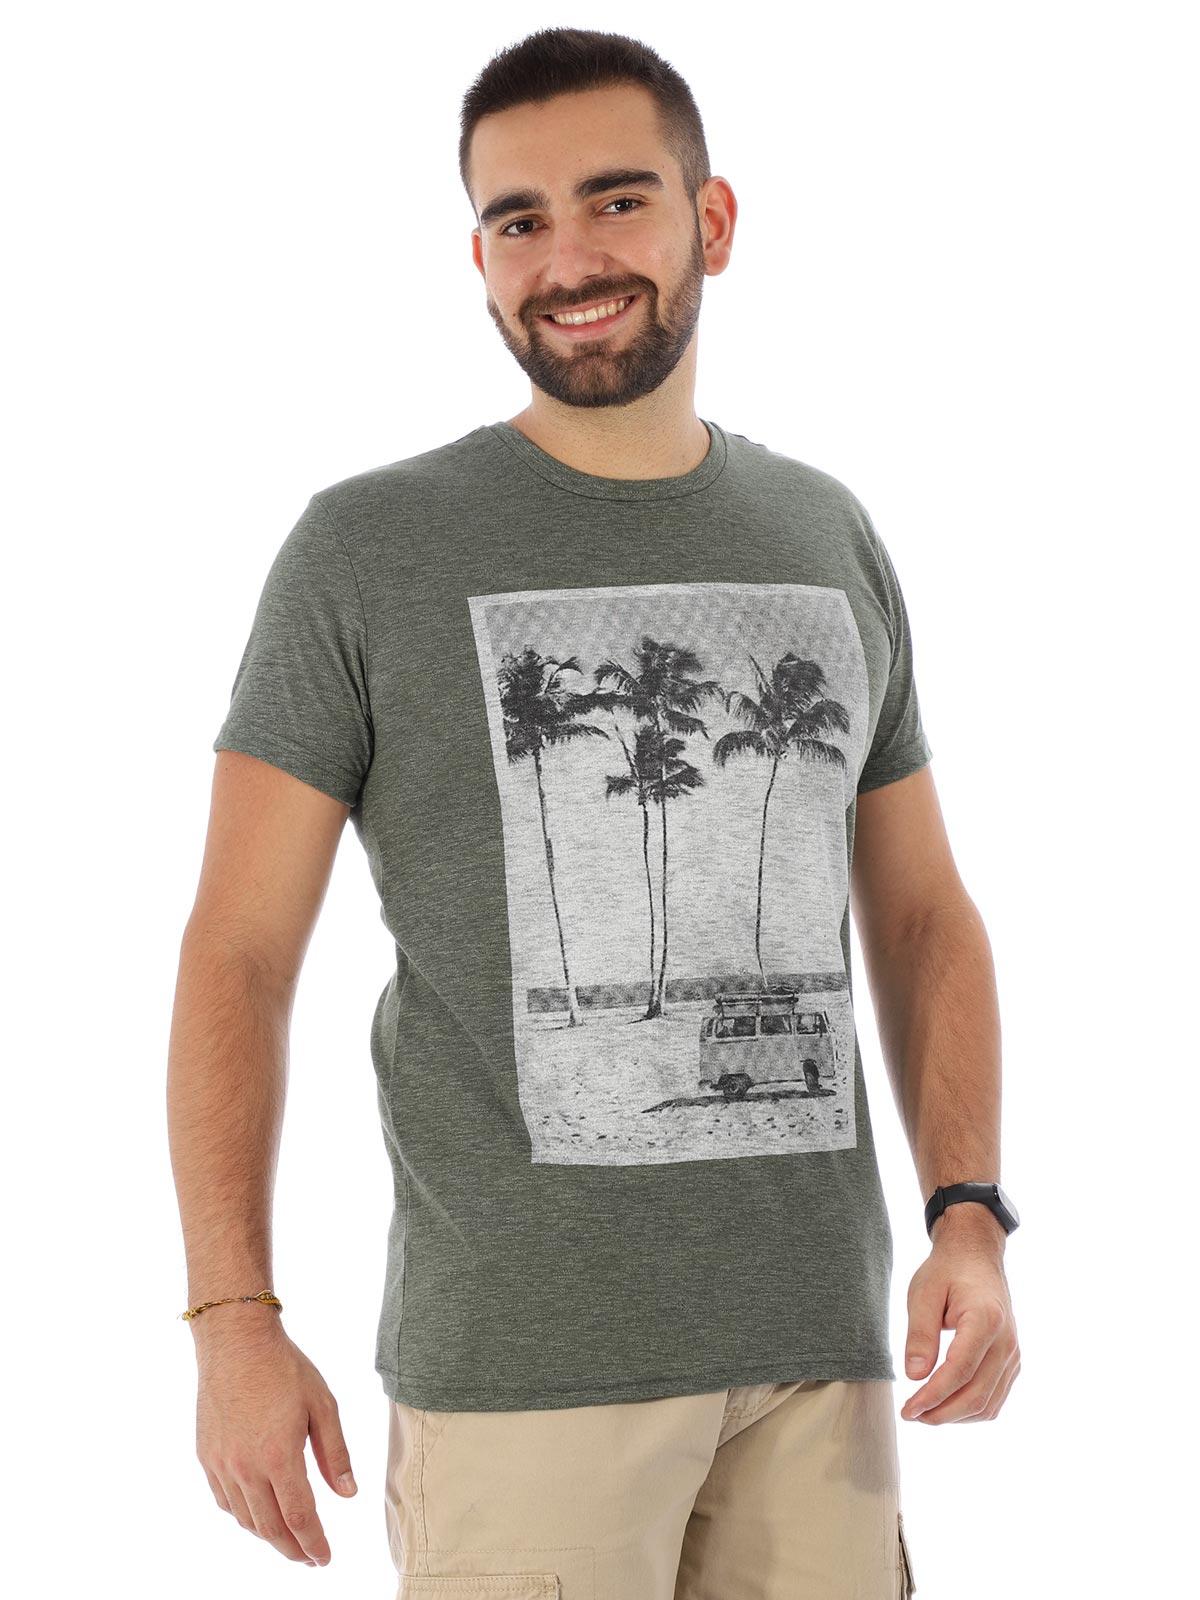 Camiseta Masculina Slim Fit Manga Curta Uno Militar